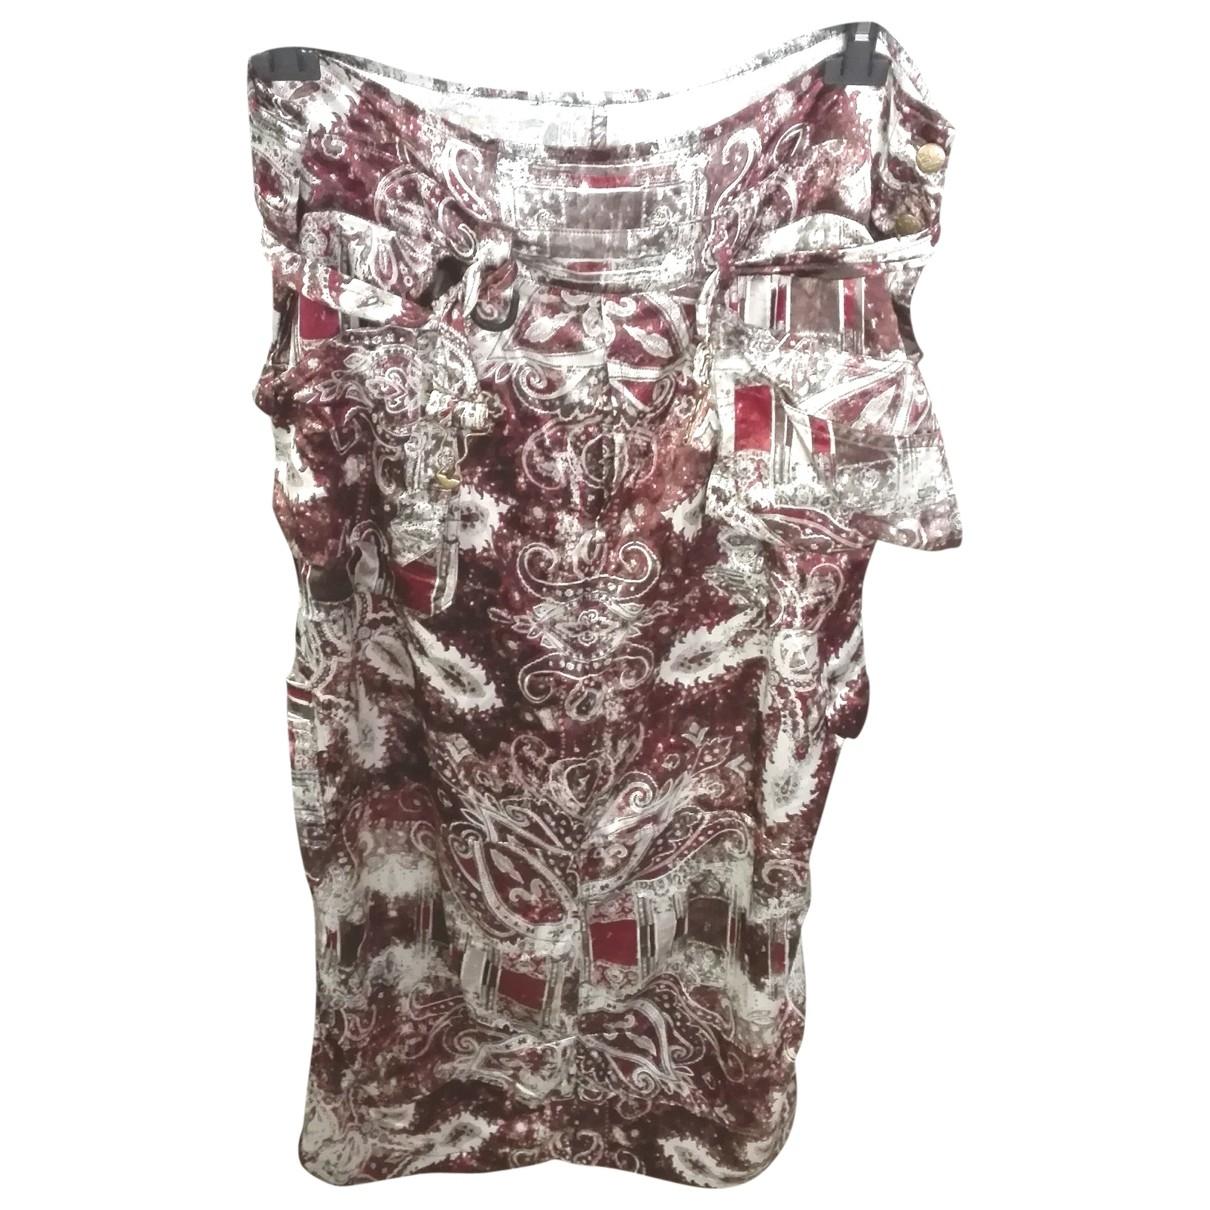 Jean Paul Gaultier \N Brown skirt for Women M International